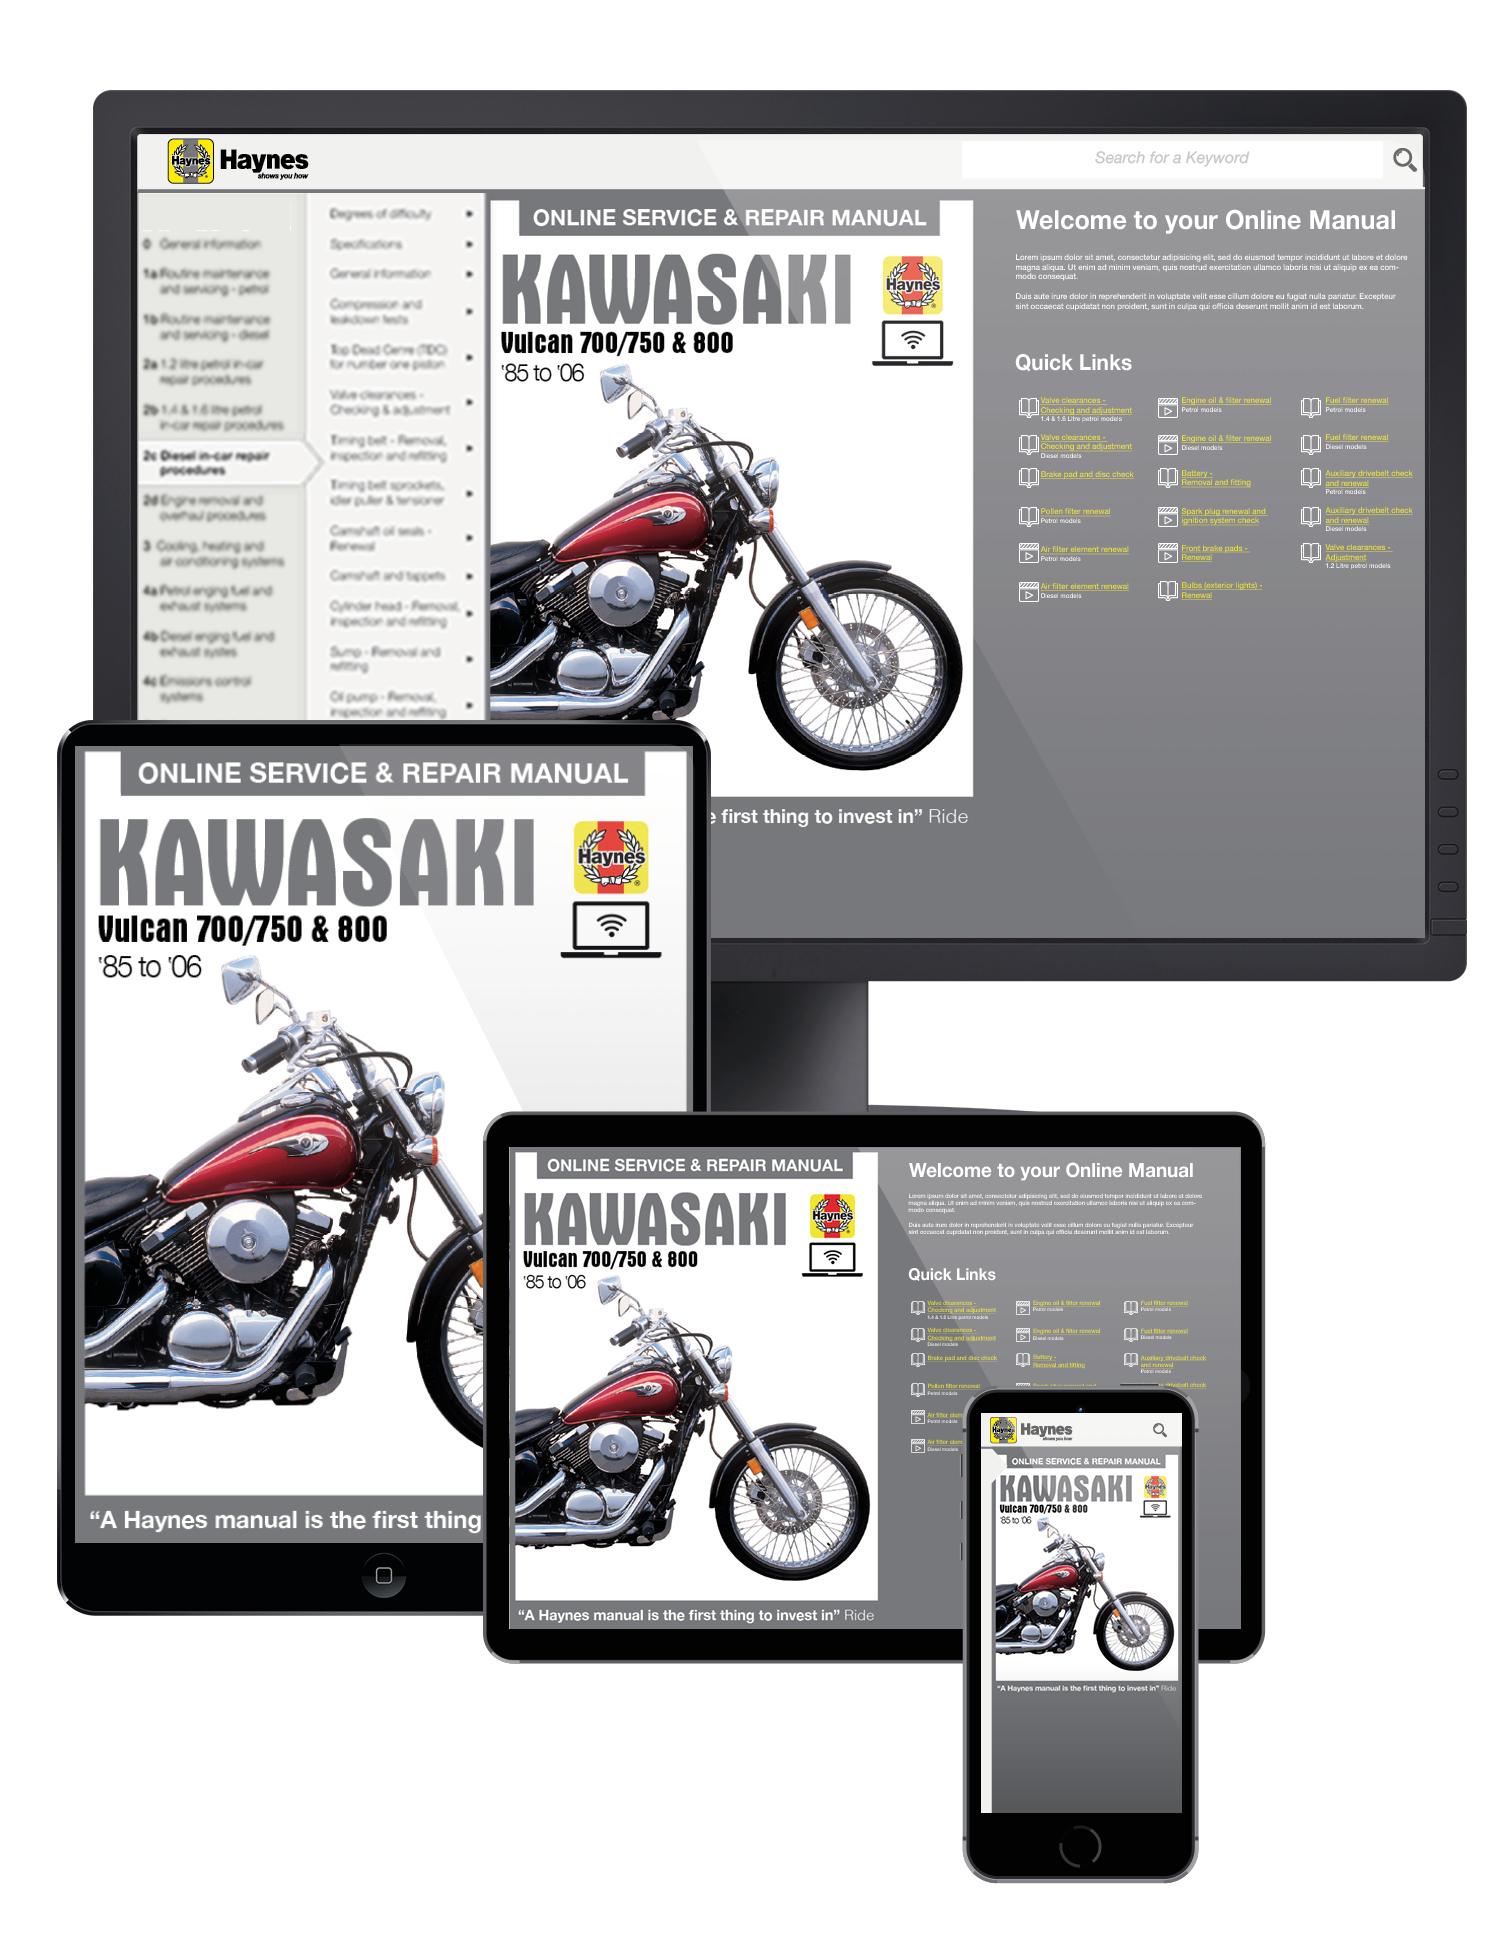 Manual cover for Kawasaki Vulcan 700 (1985), Vulcan 750 (85-06), Vulcan 800 (95-05), Vulcan 800 Classic (96-02) & Vulcan 800 Drifter (99-06) Haynes Online Manual